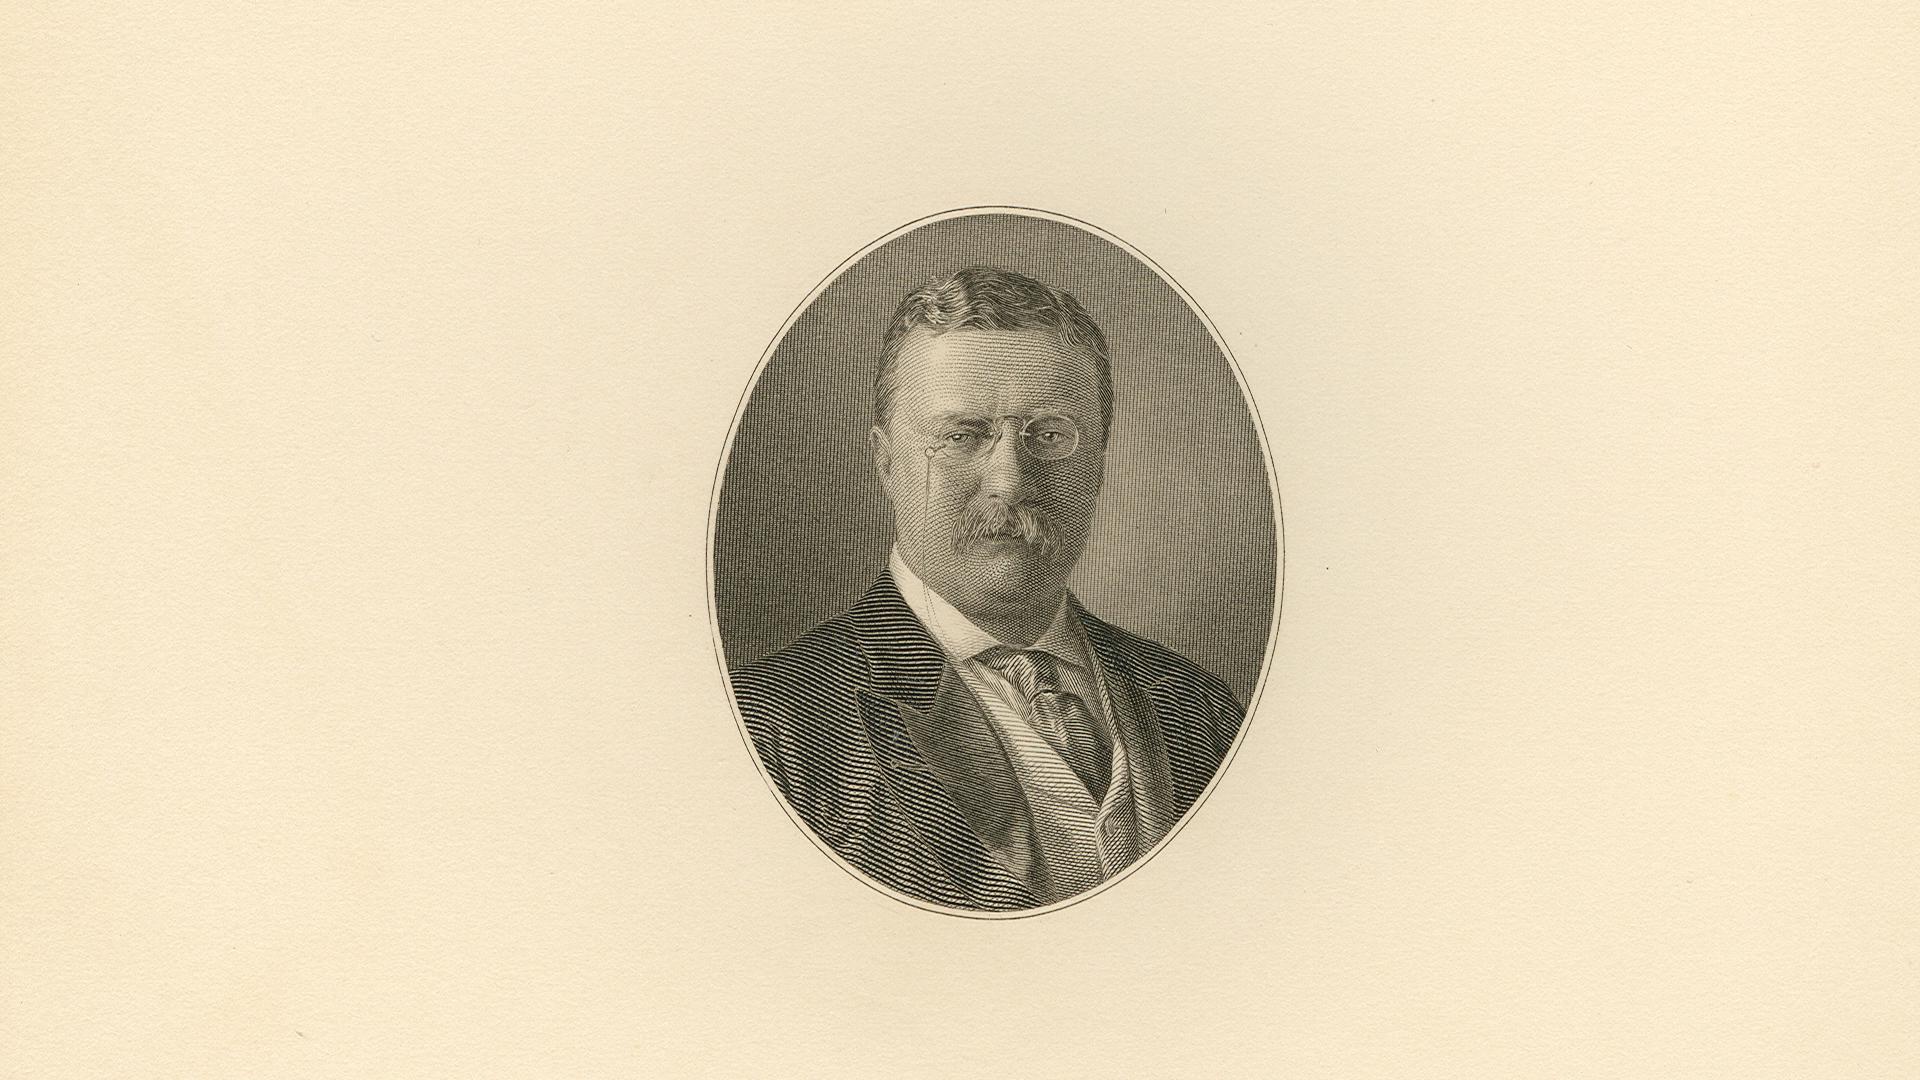 Image - roosevelts portrait on invitation.jpg